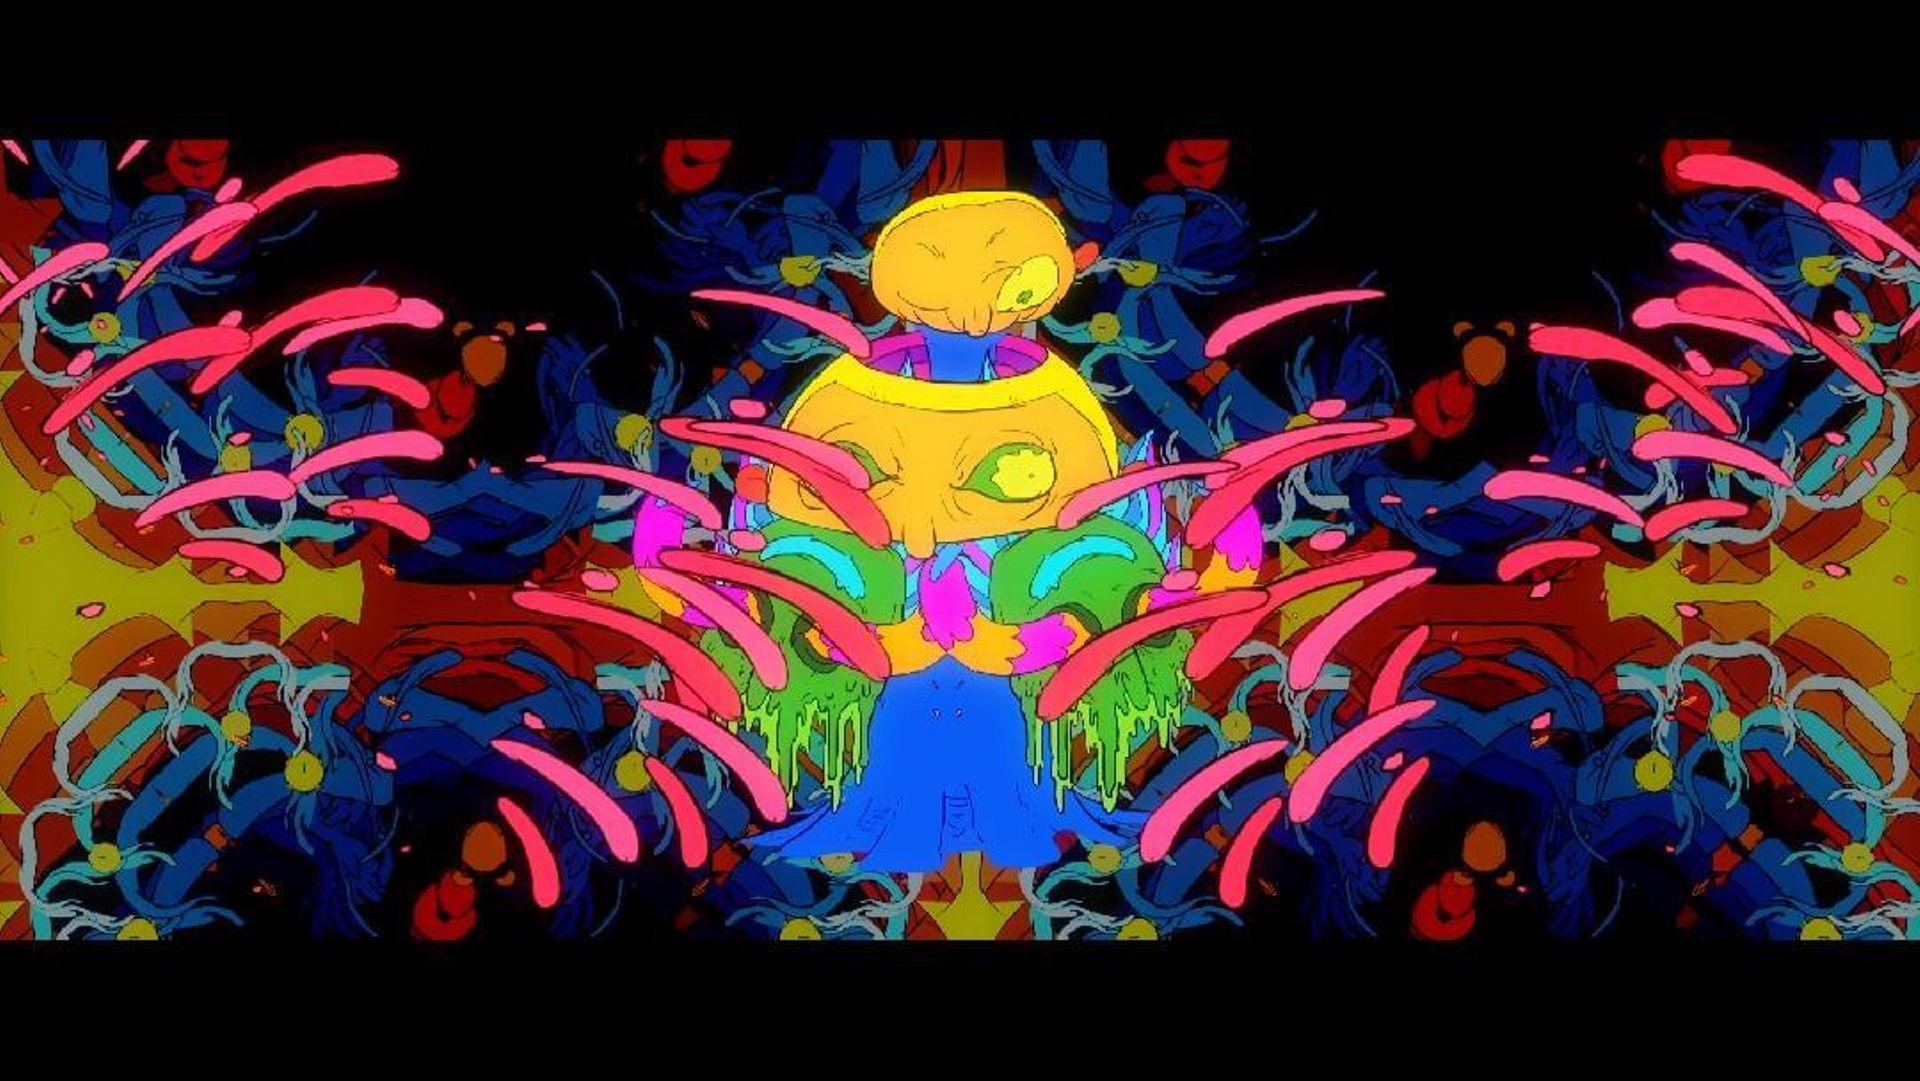 Rick and Morty - RAM: Sploosh